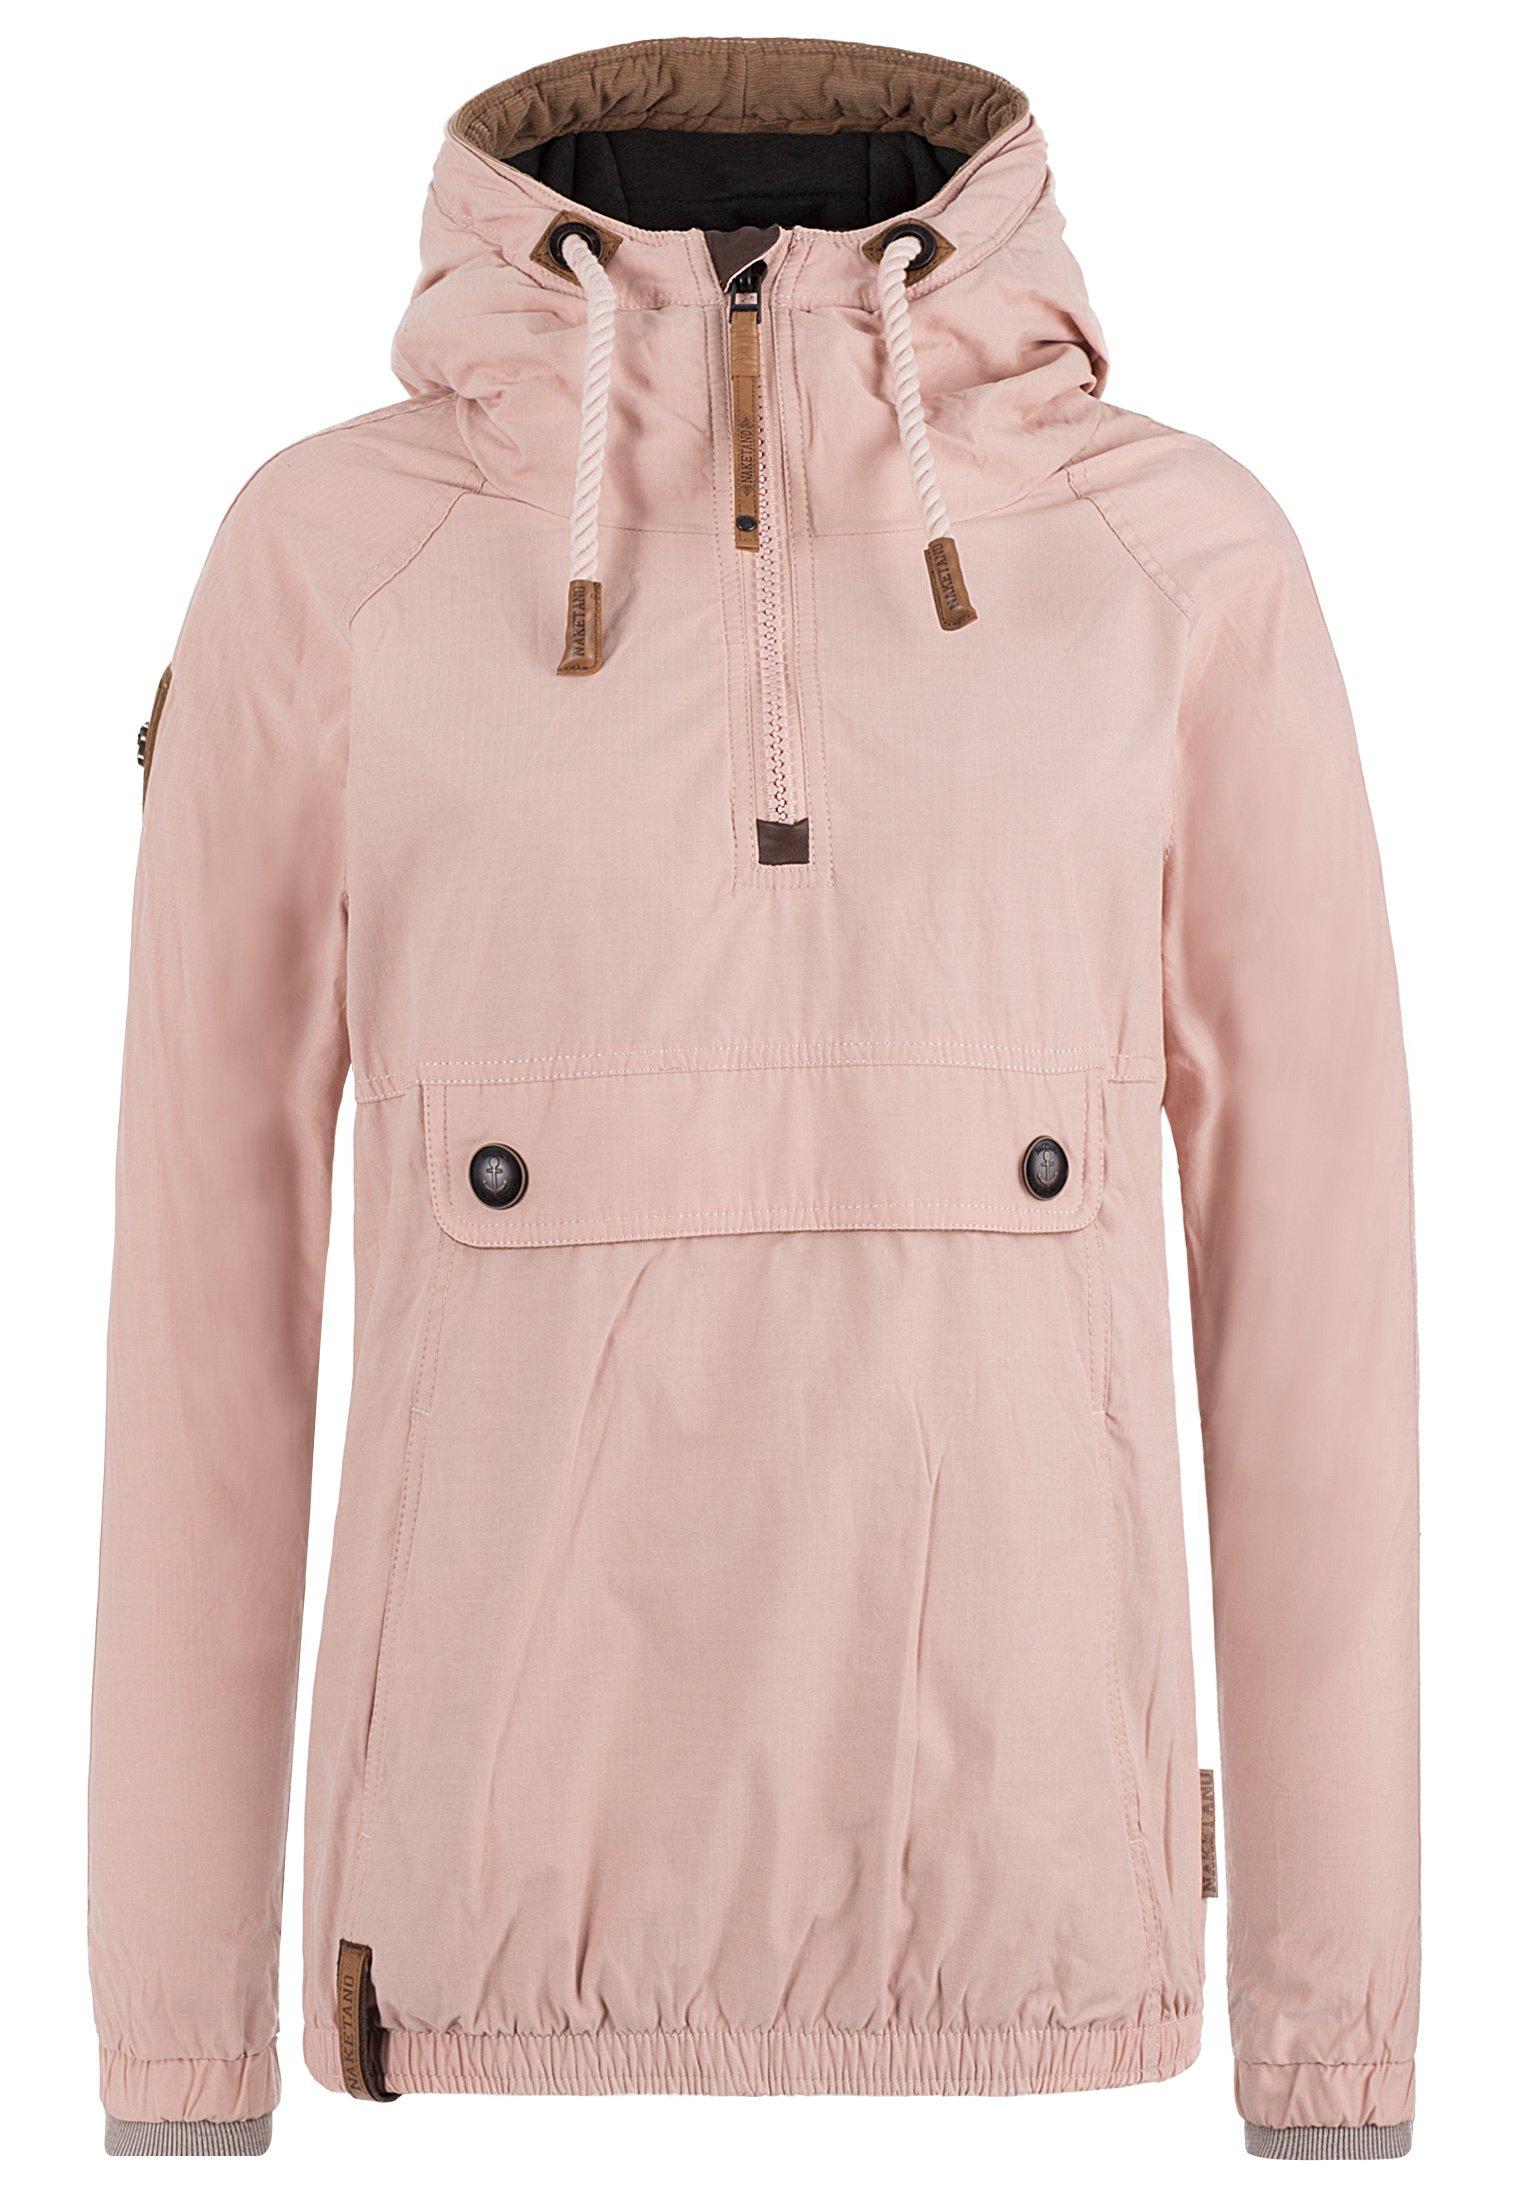 Naketano Women's Jacket Penisbutter Dusty Pink, XL by Naketano